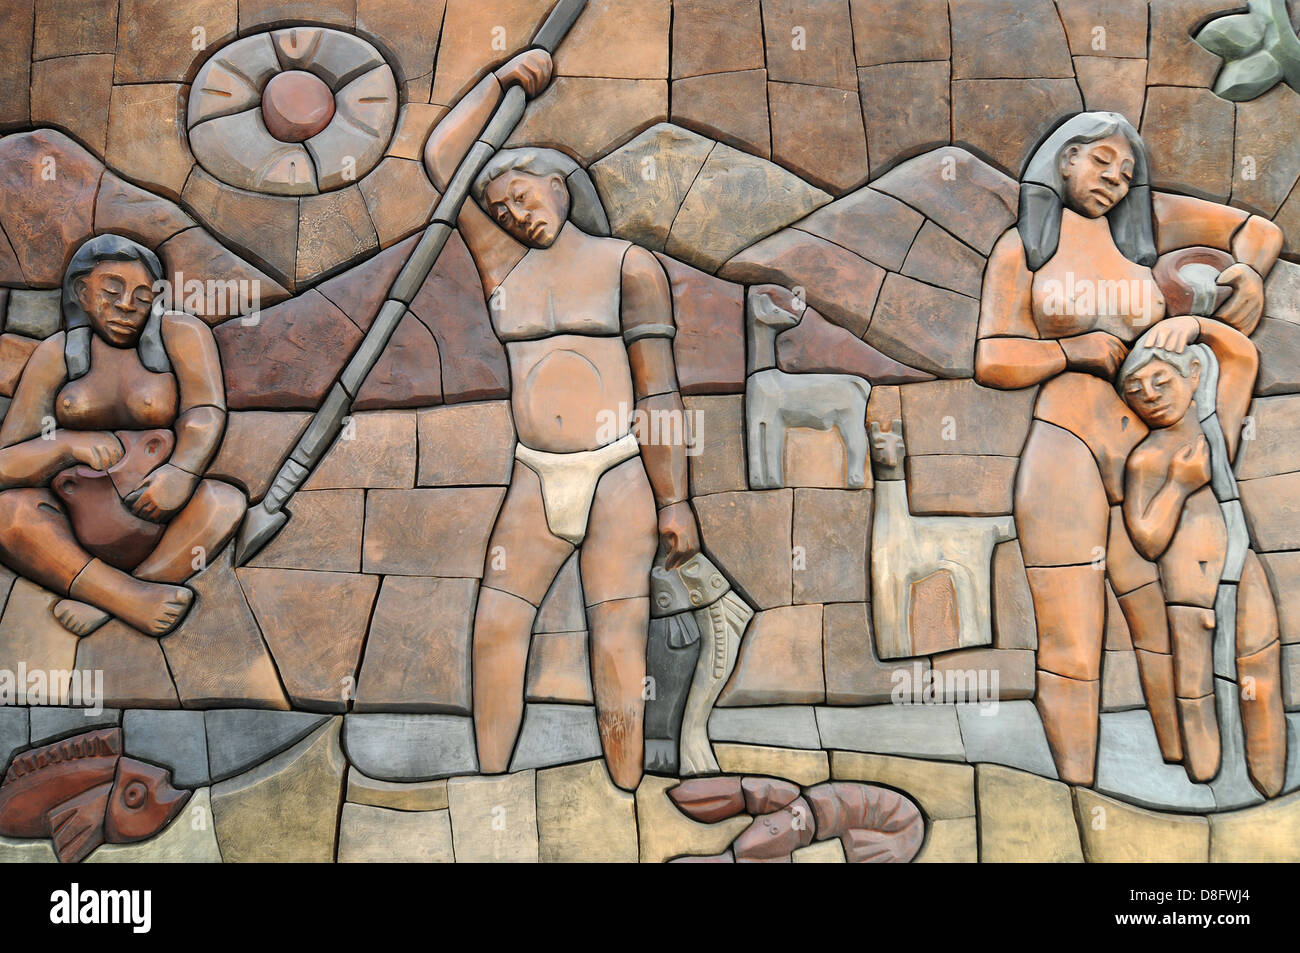 Indigenous people - Stock Image